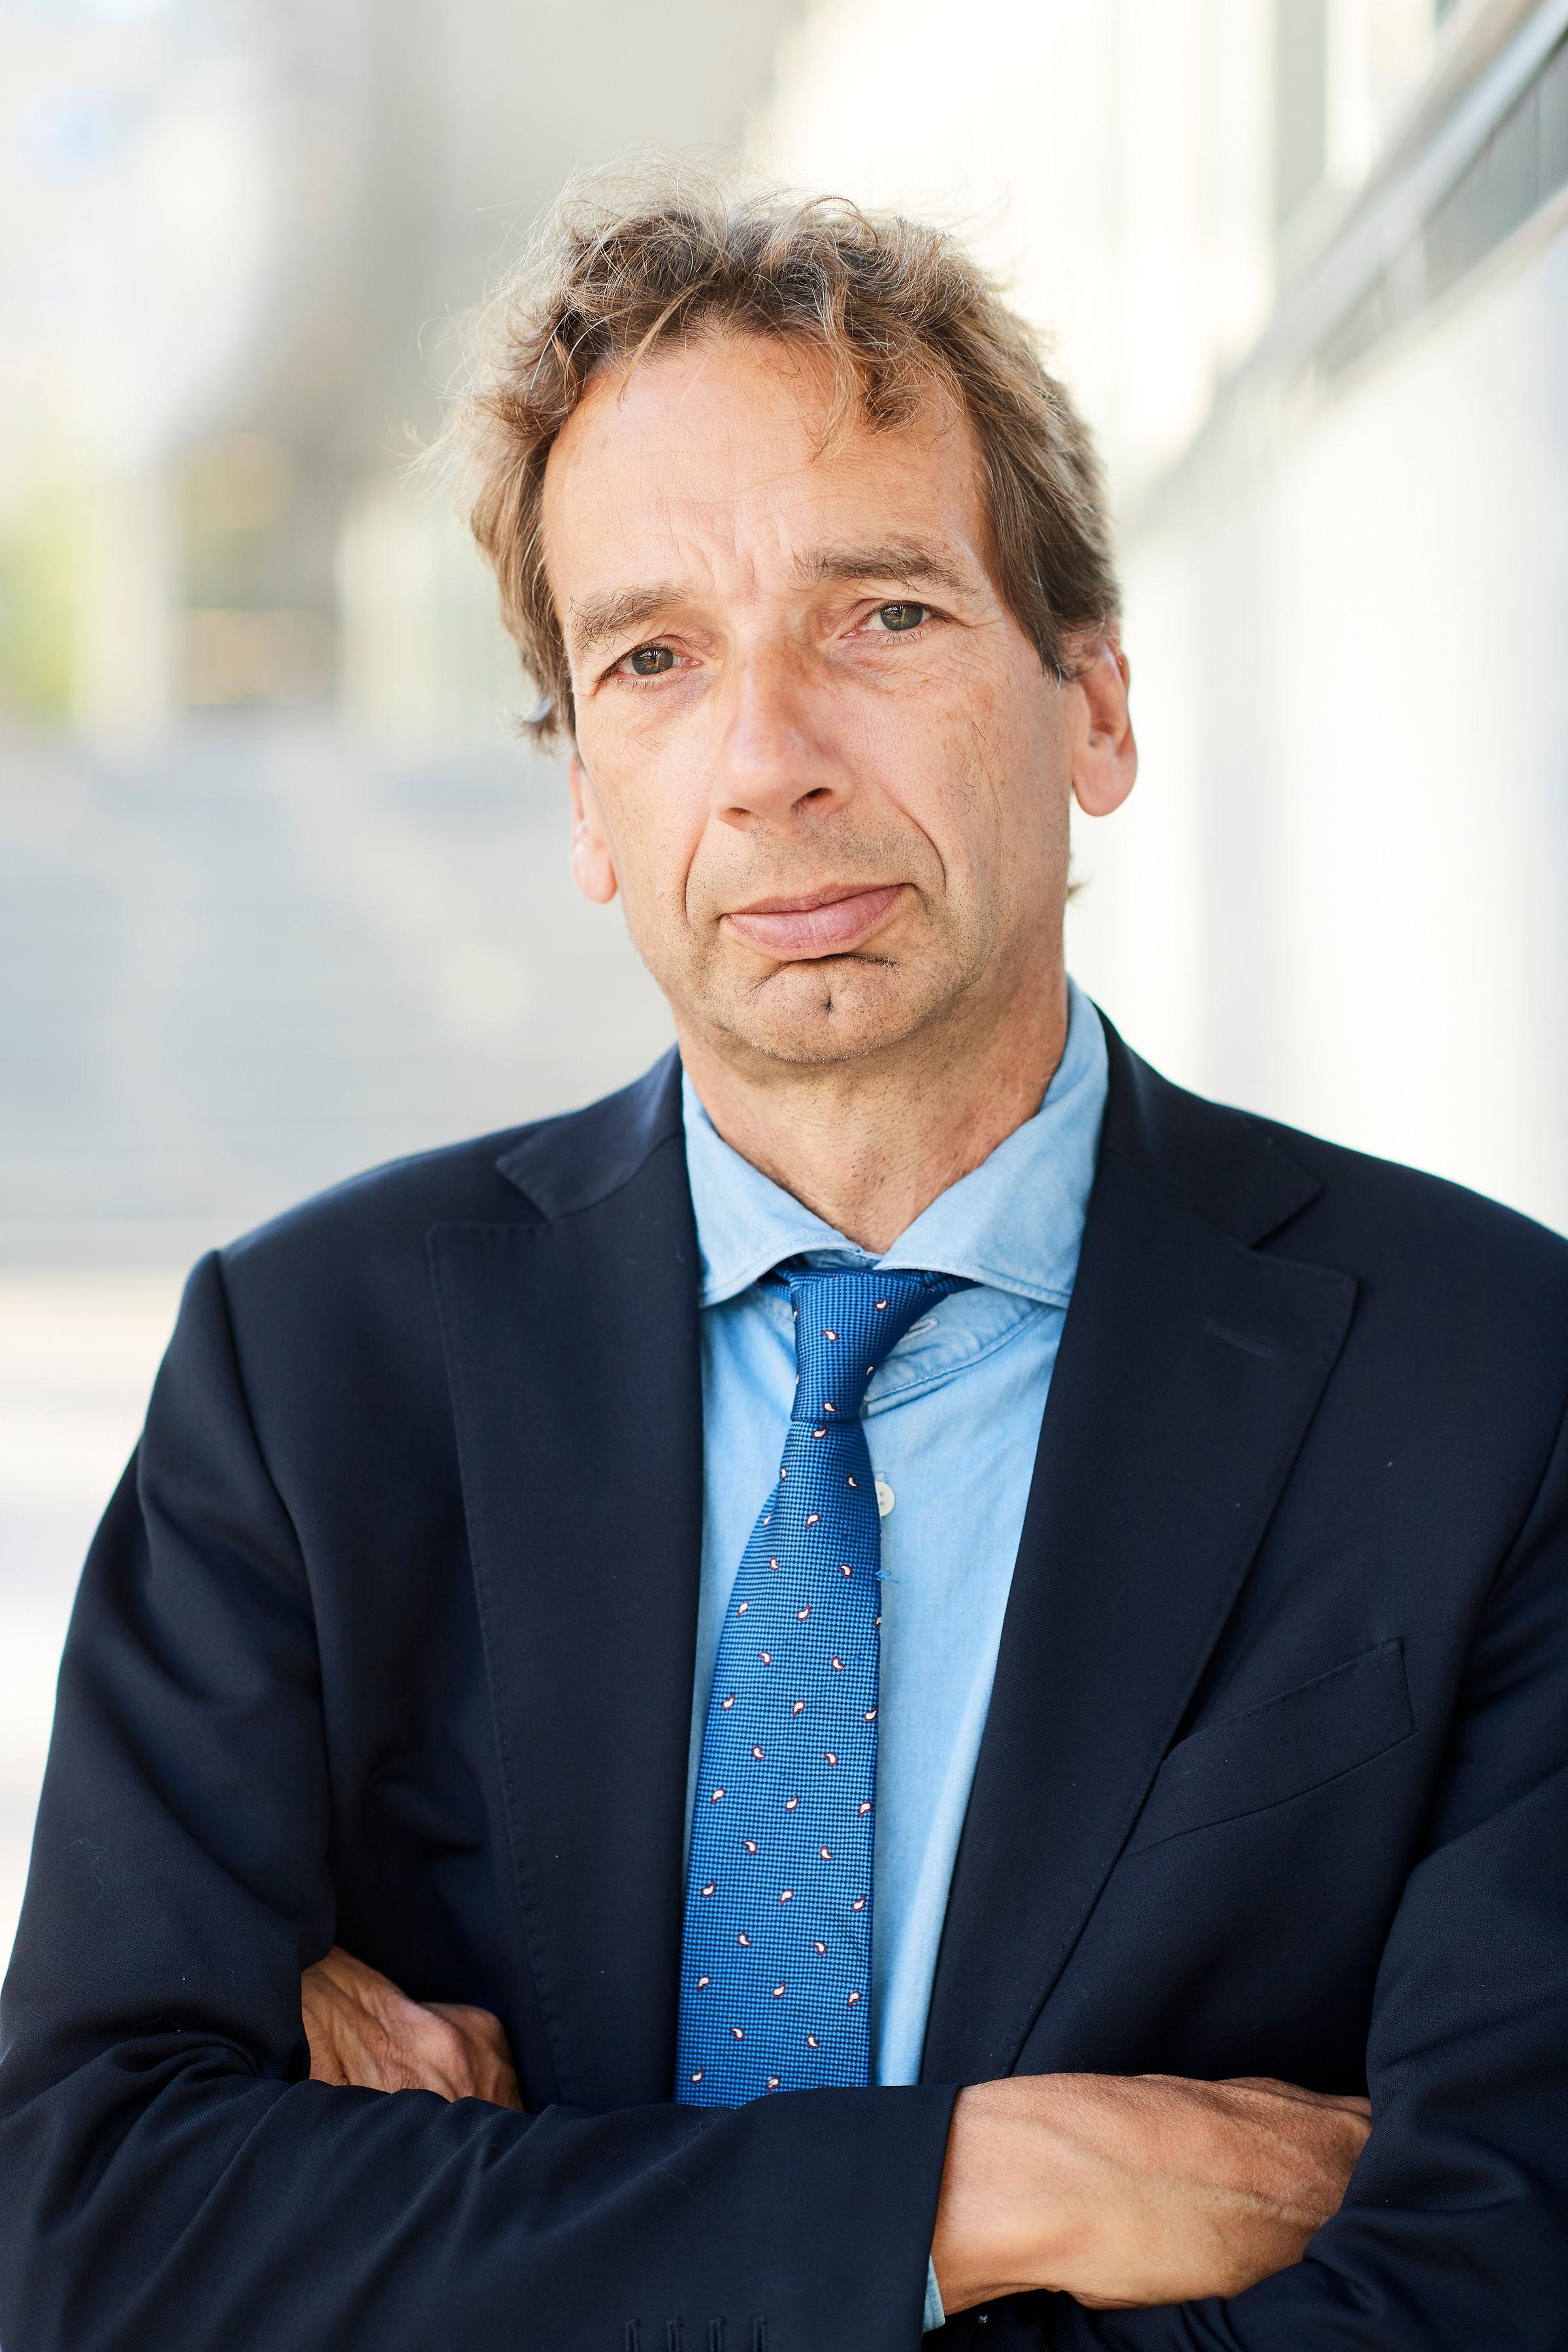 Karel Beckman, Author at Energy Post